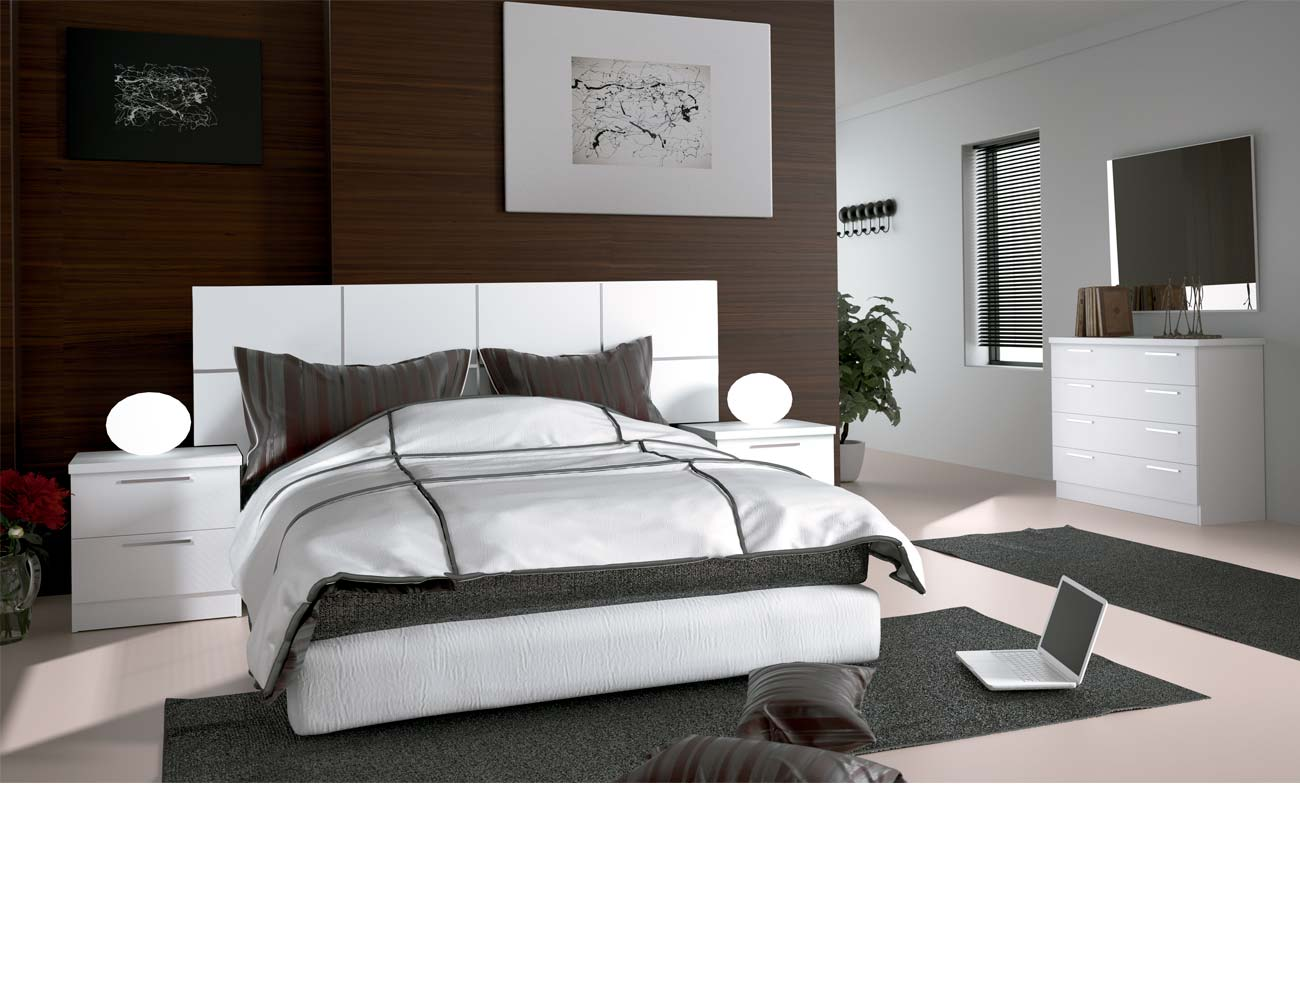 Dormitorio matrimonio moderno 38 blanco